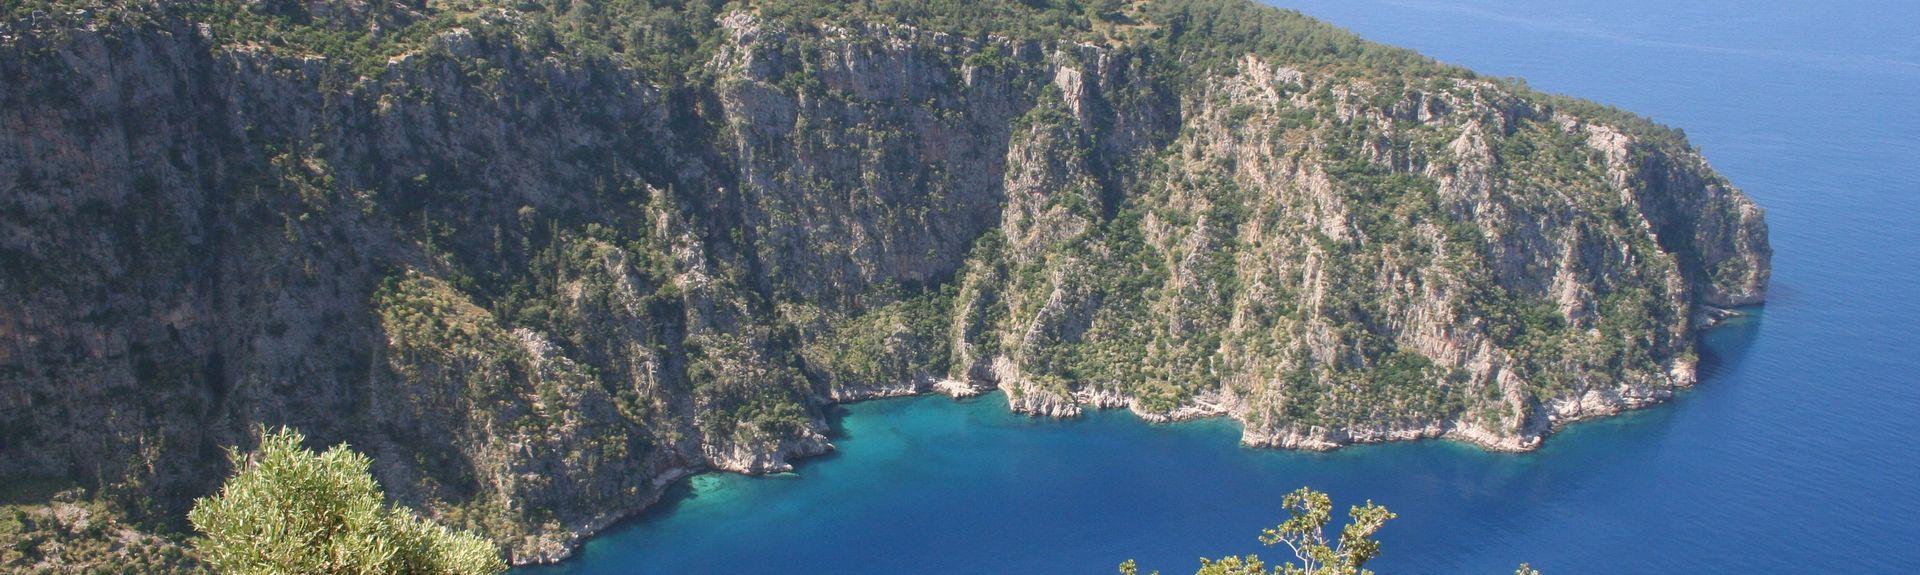 Oludeniz, Fethiye, Provincia di Mugla, Turchia